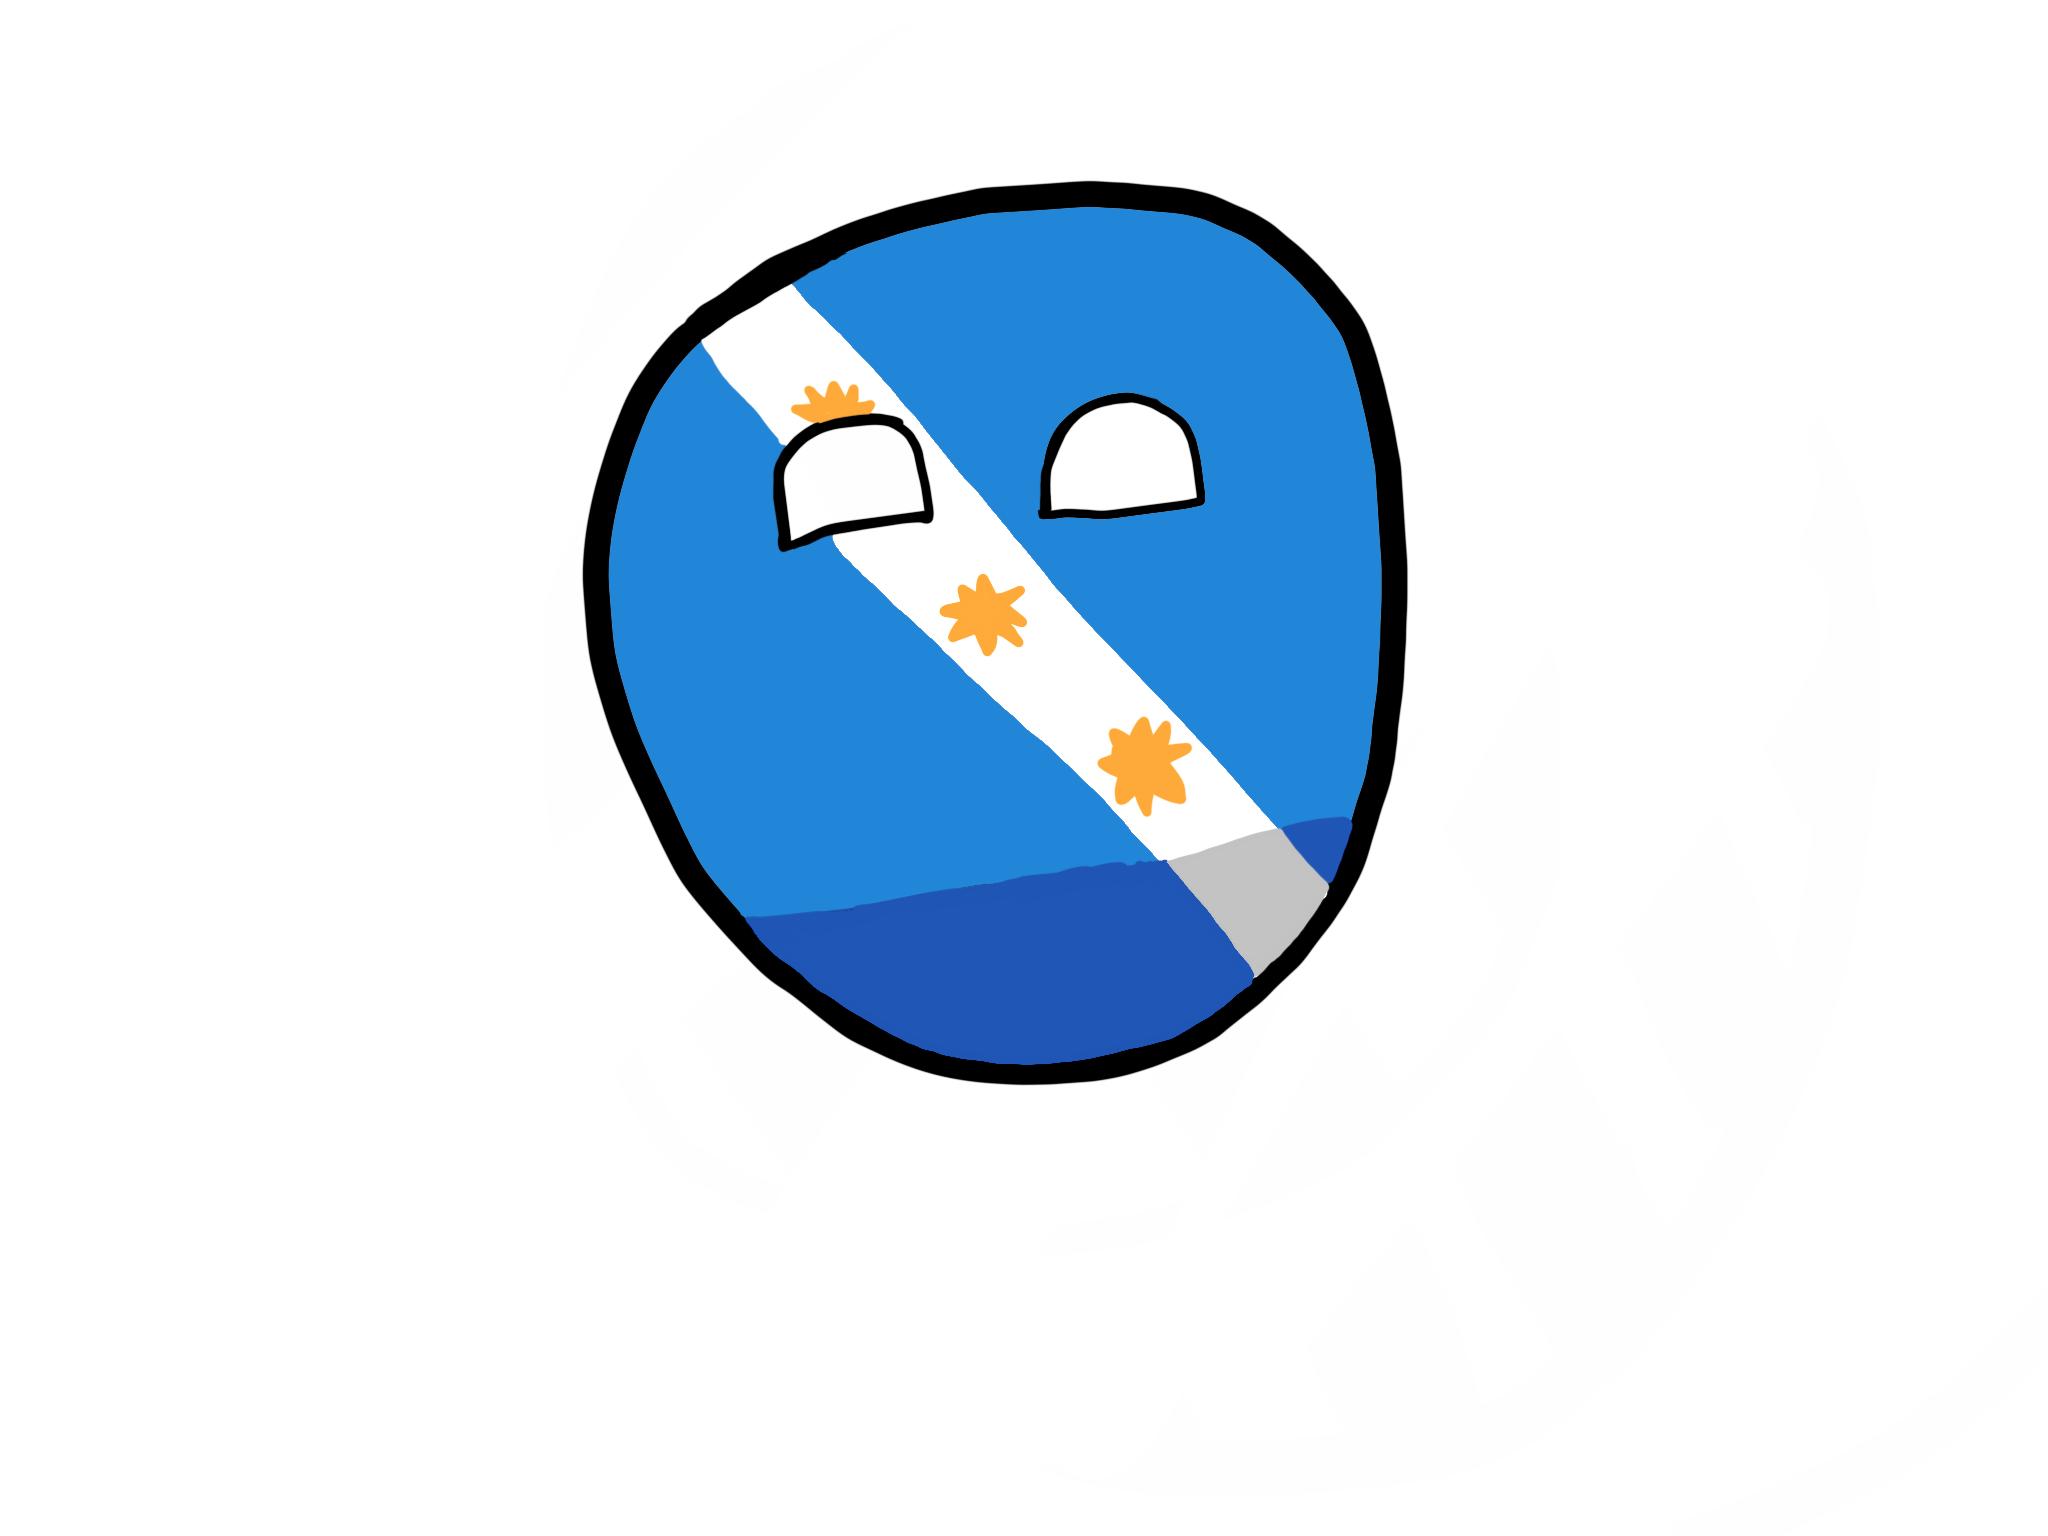 Seregnoball